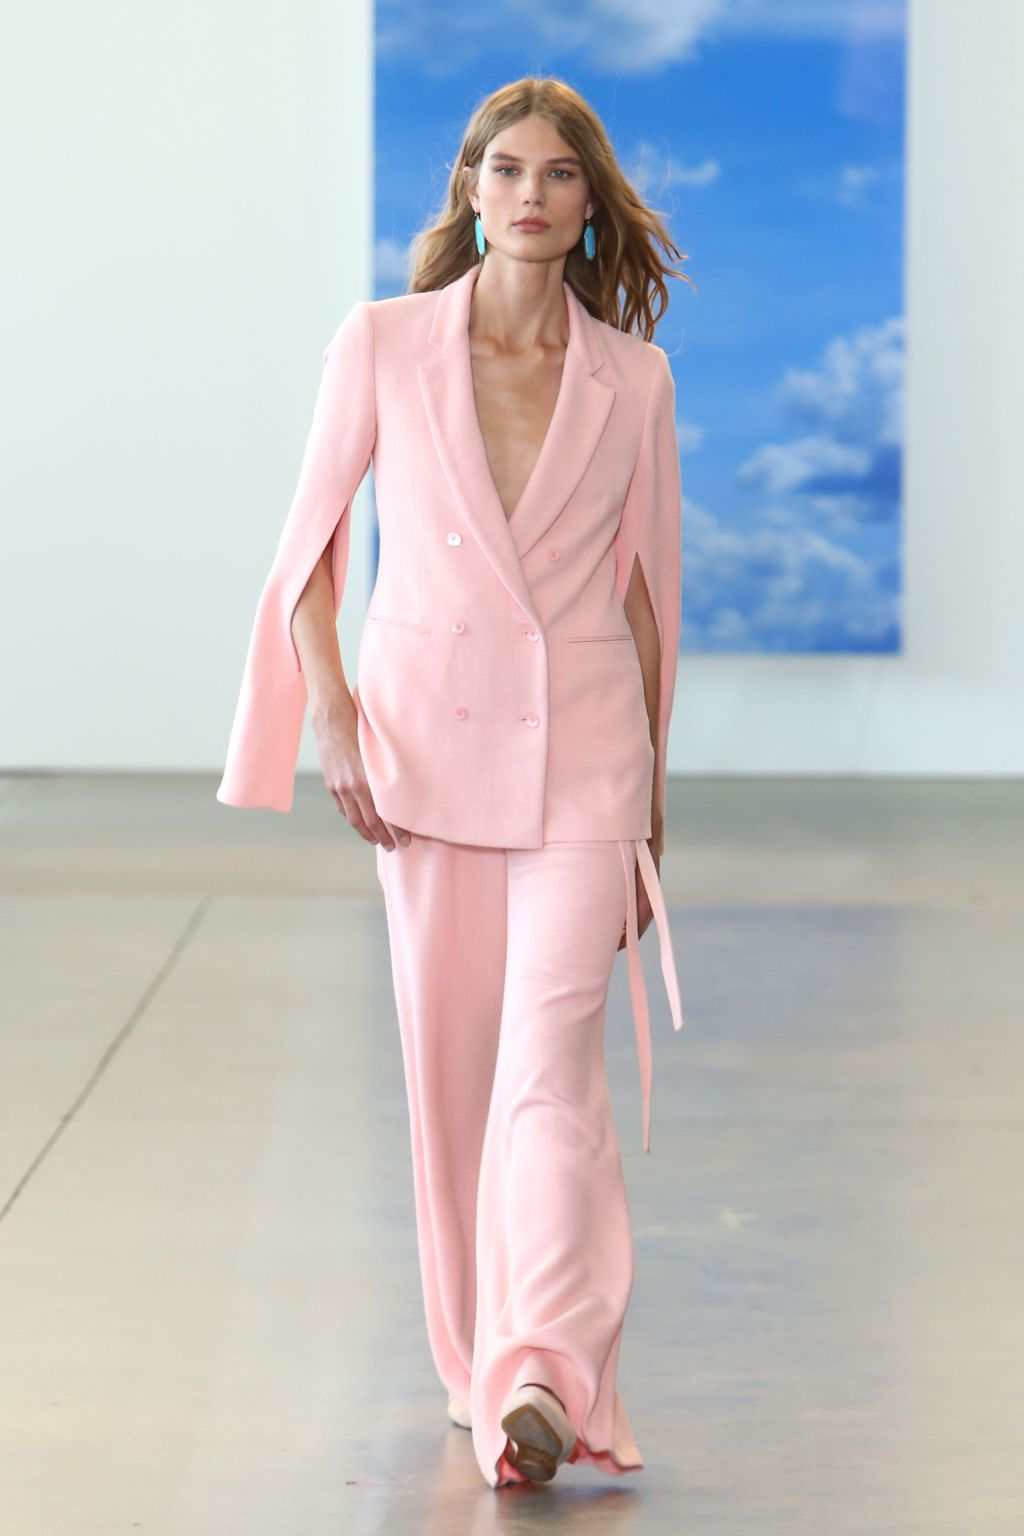 ropa-de-moda-2018-traje-color-rosa